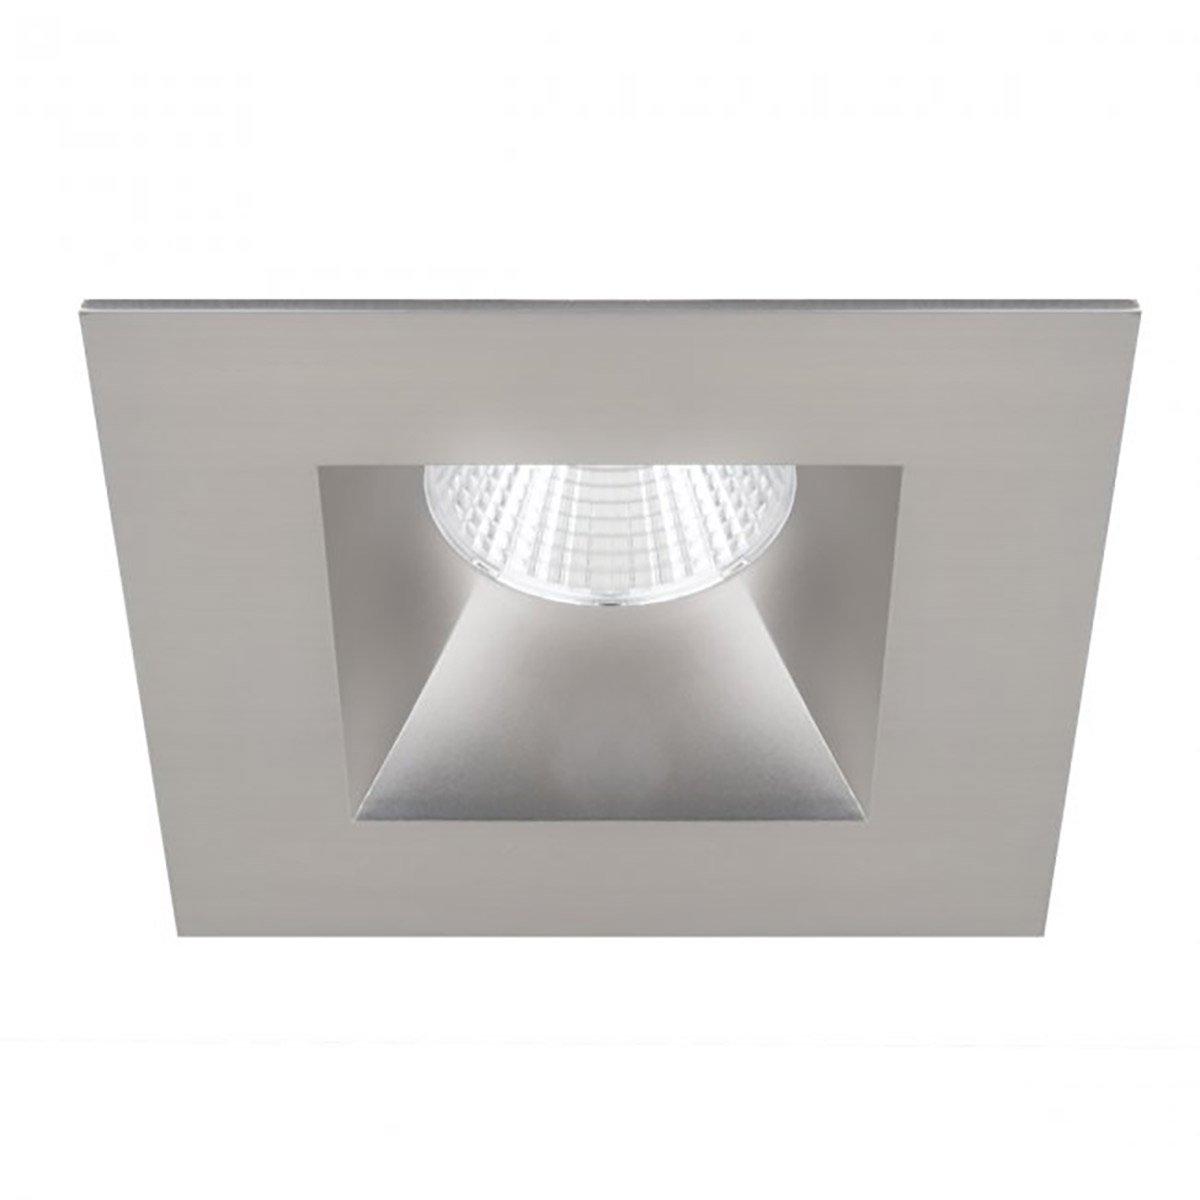 WAC Lighting R3BSD-F927-HZWT Oculux 3.5 LED Square Open Reflector Flood 2700K Trim Engine Haze White